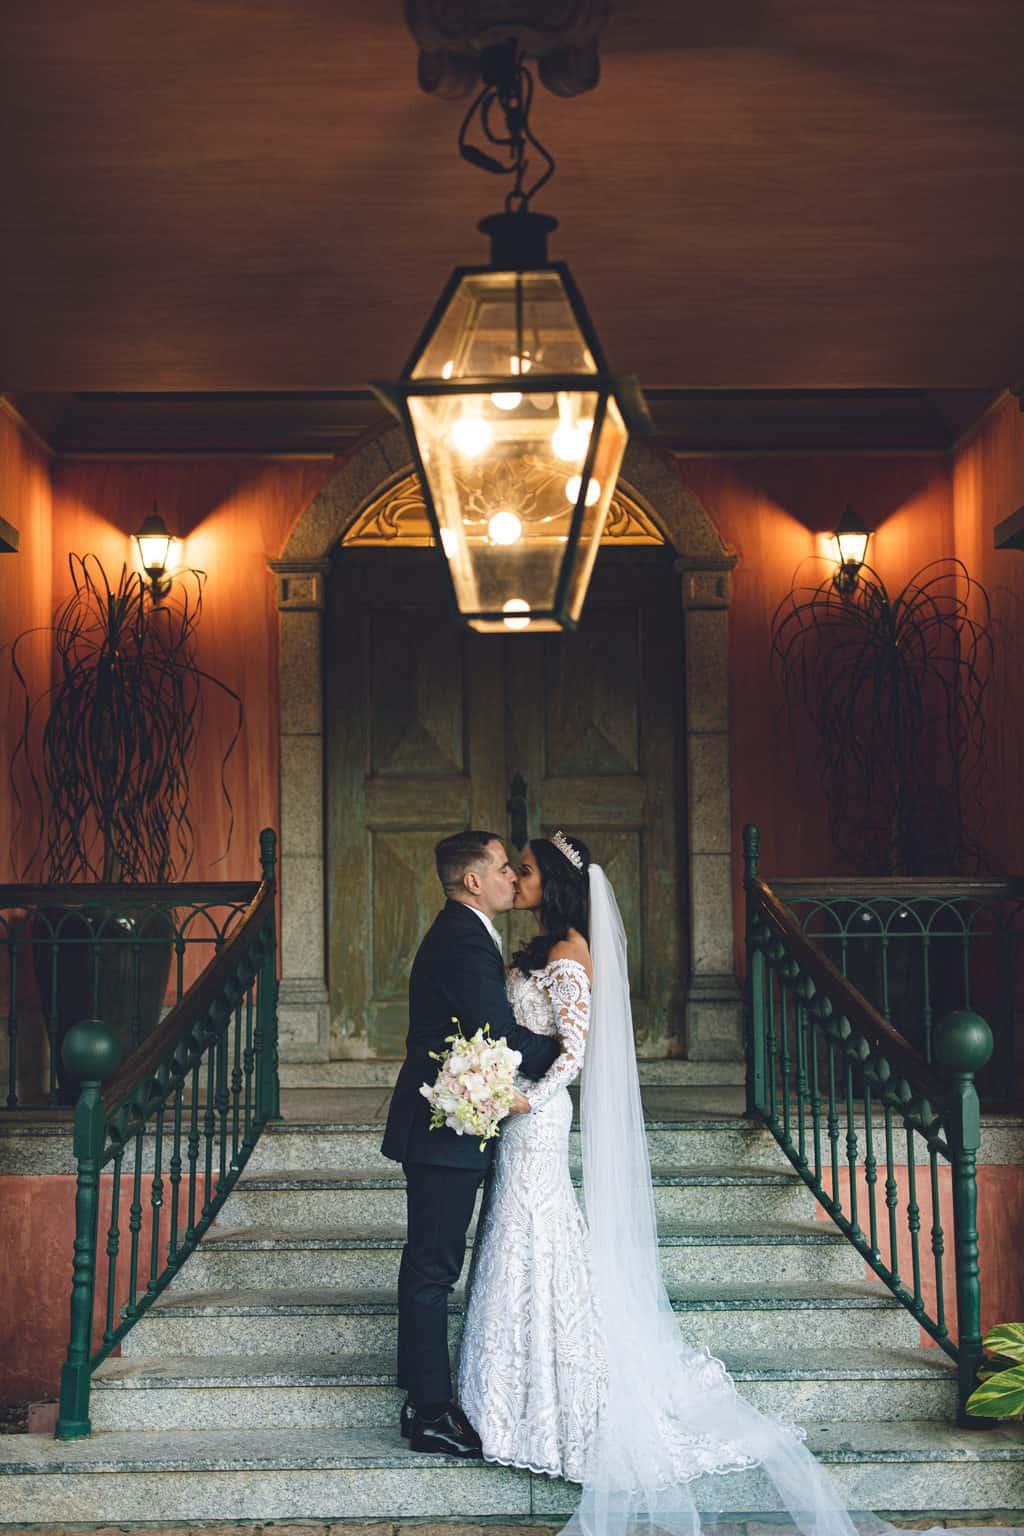 Casamento-de-Bianka-e-Nilo-Fotografia-Marcelo-Schmoeller-SC-Alameda-Casa-Rosa-03082019_bianka-e-nilo_1997